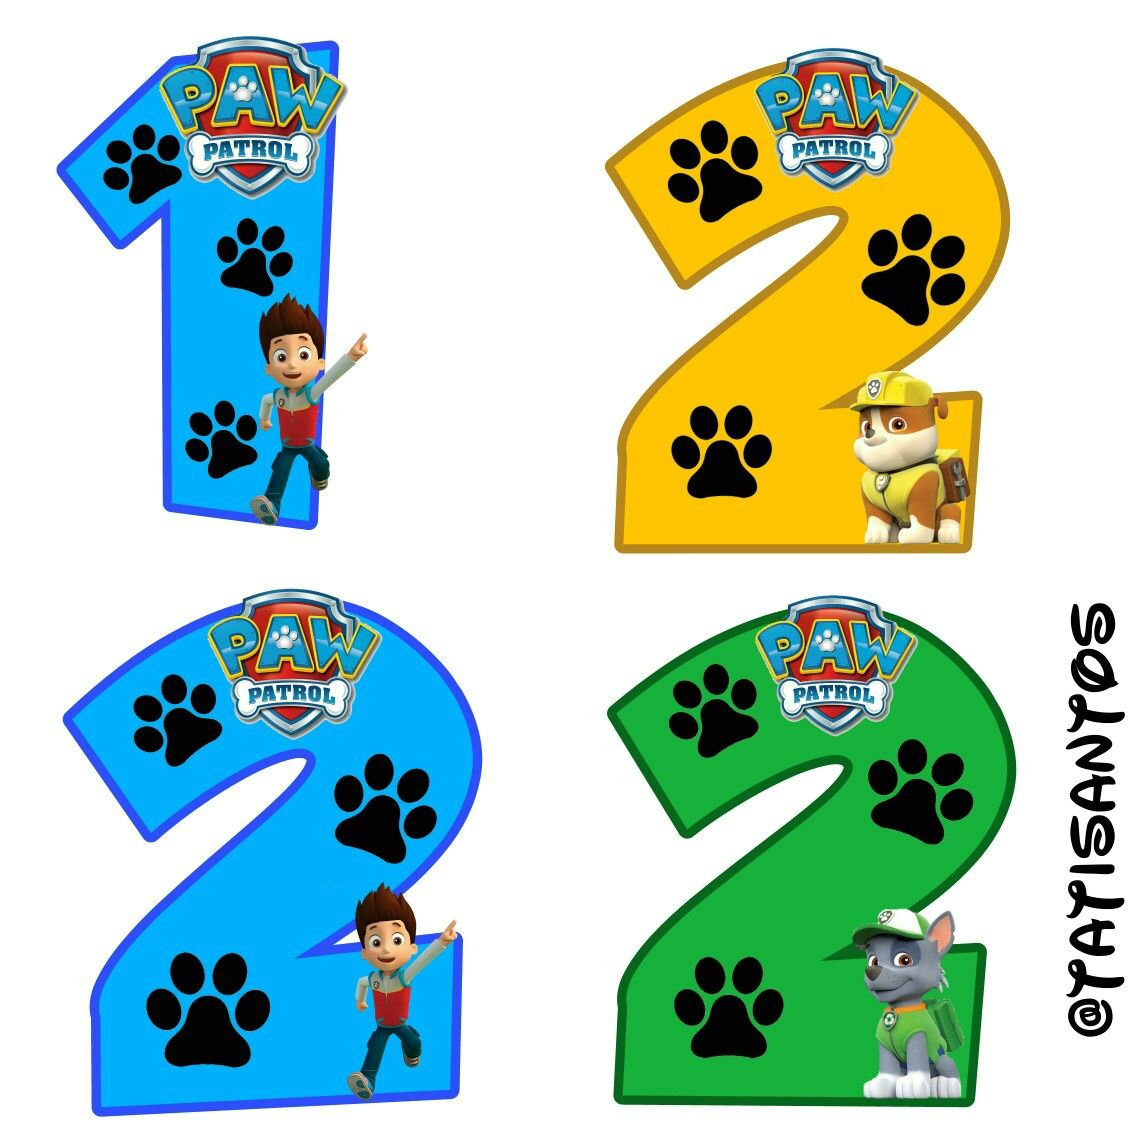 N 250 Meros Personalizados Patrulha Canina 1 E 2 Patrulha